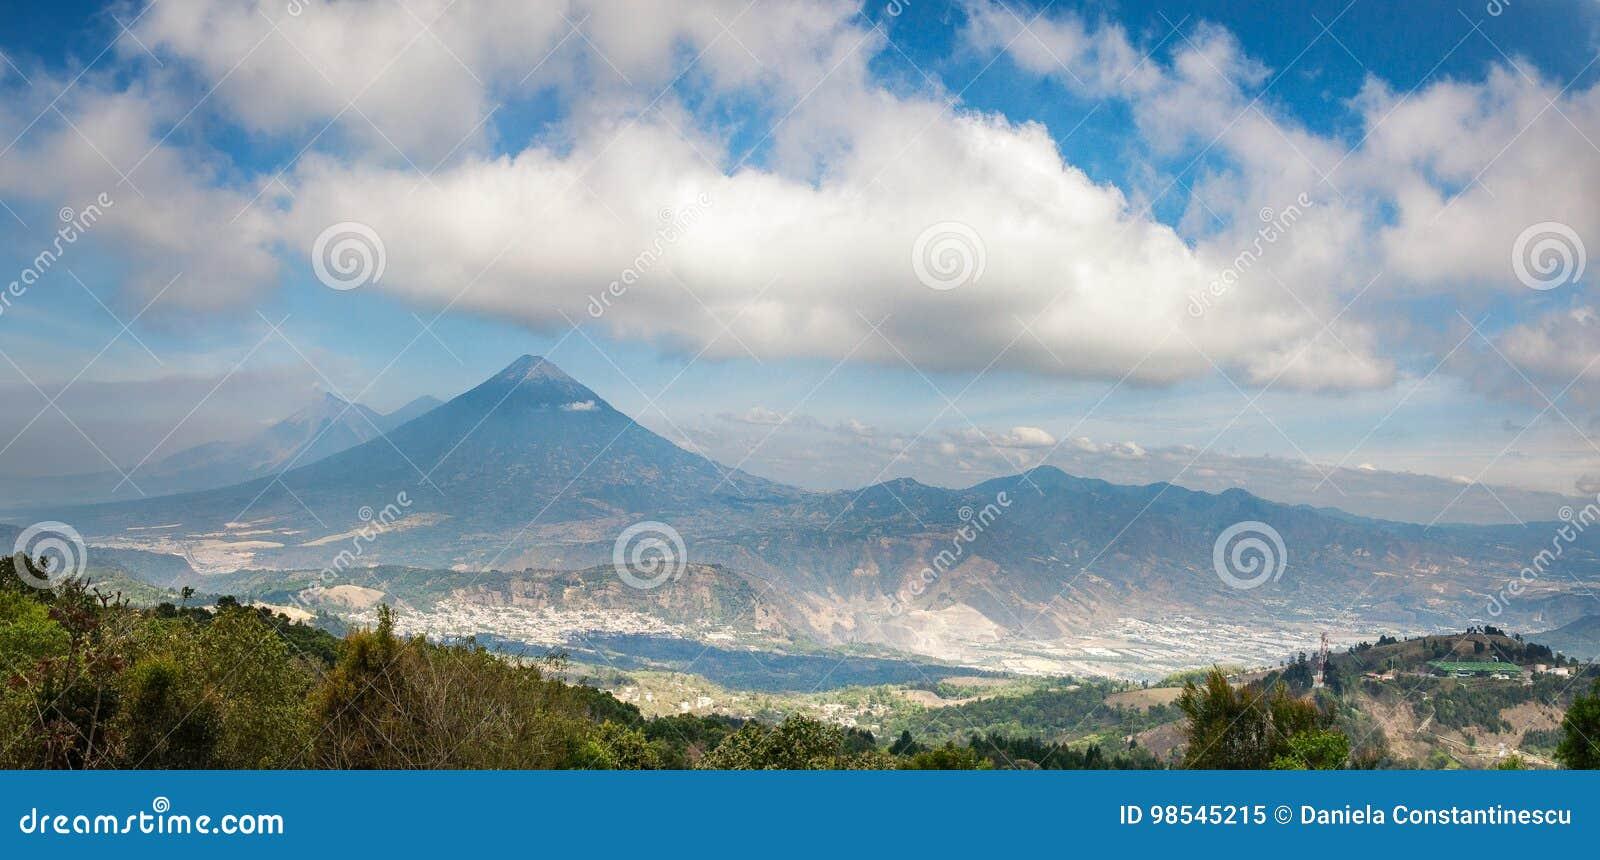 Panoramic vista of the volcanic mountain range near Antigua in Guatemala